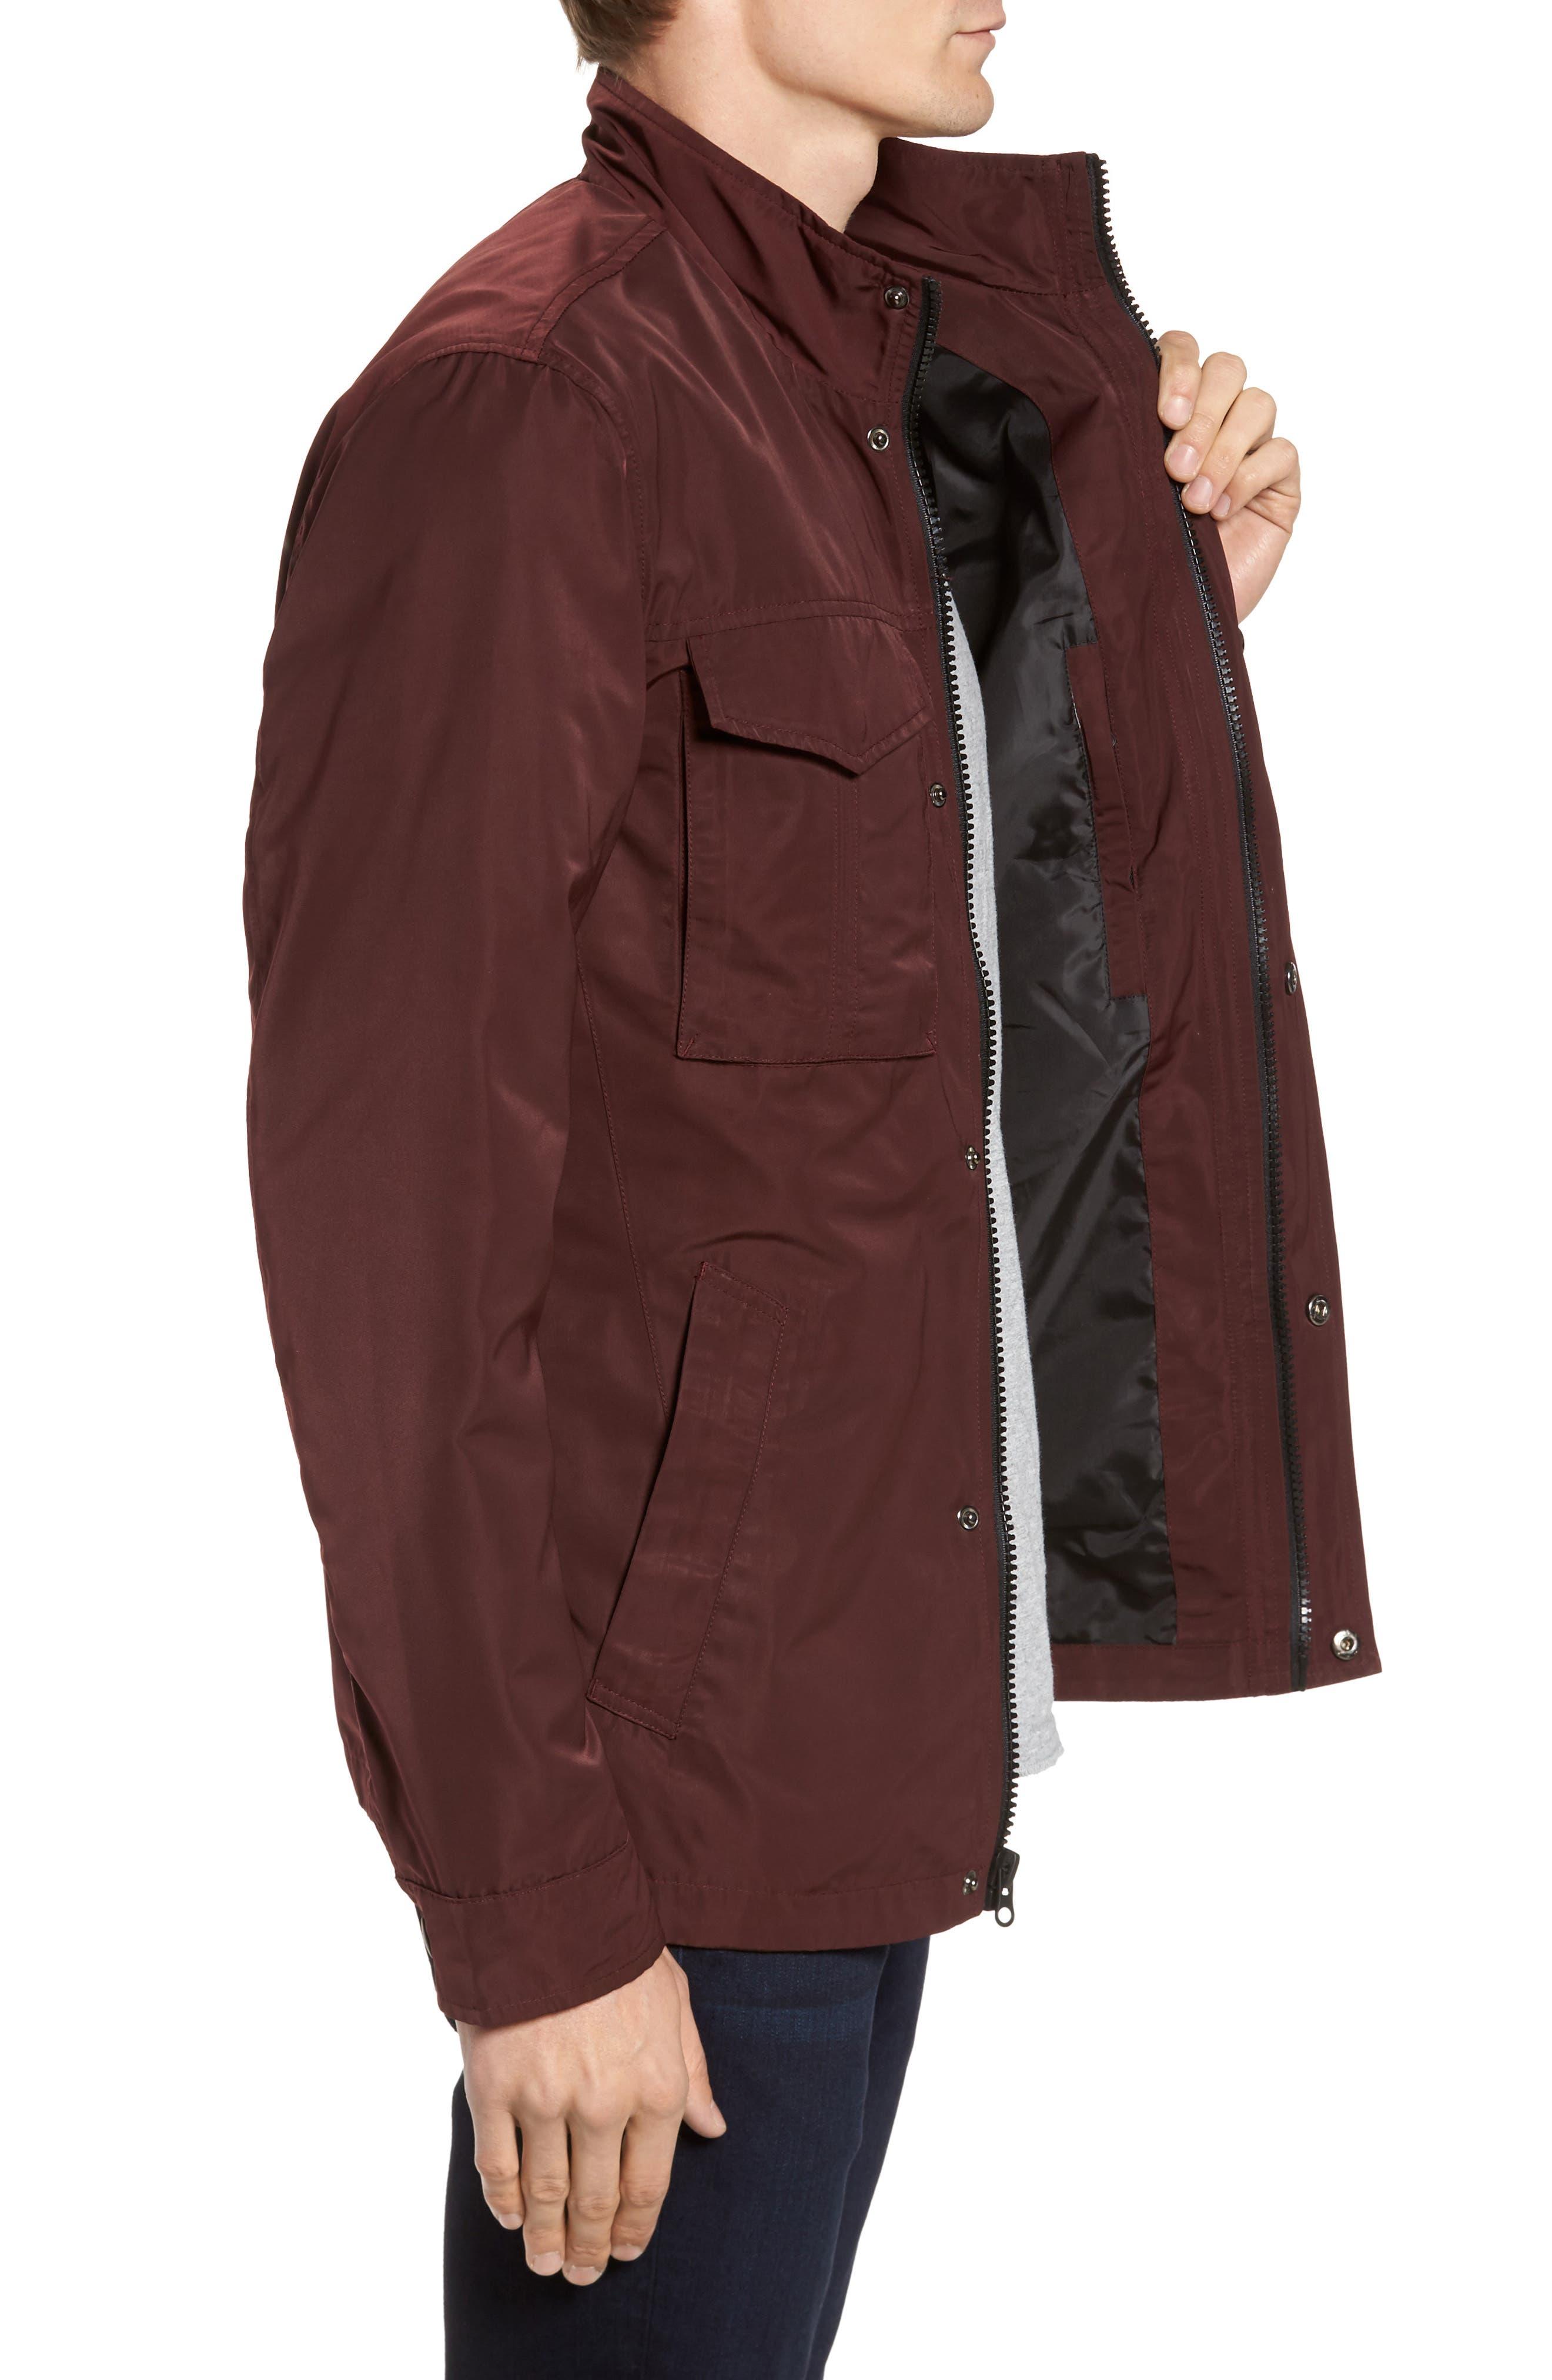 Dougie Waterproof Jacket,                             Alternate thumbnail 3, color,                             Mulberry